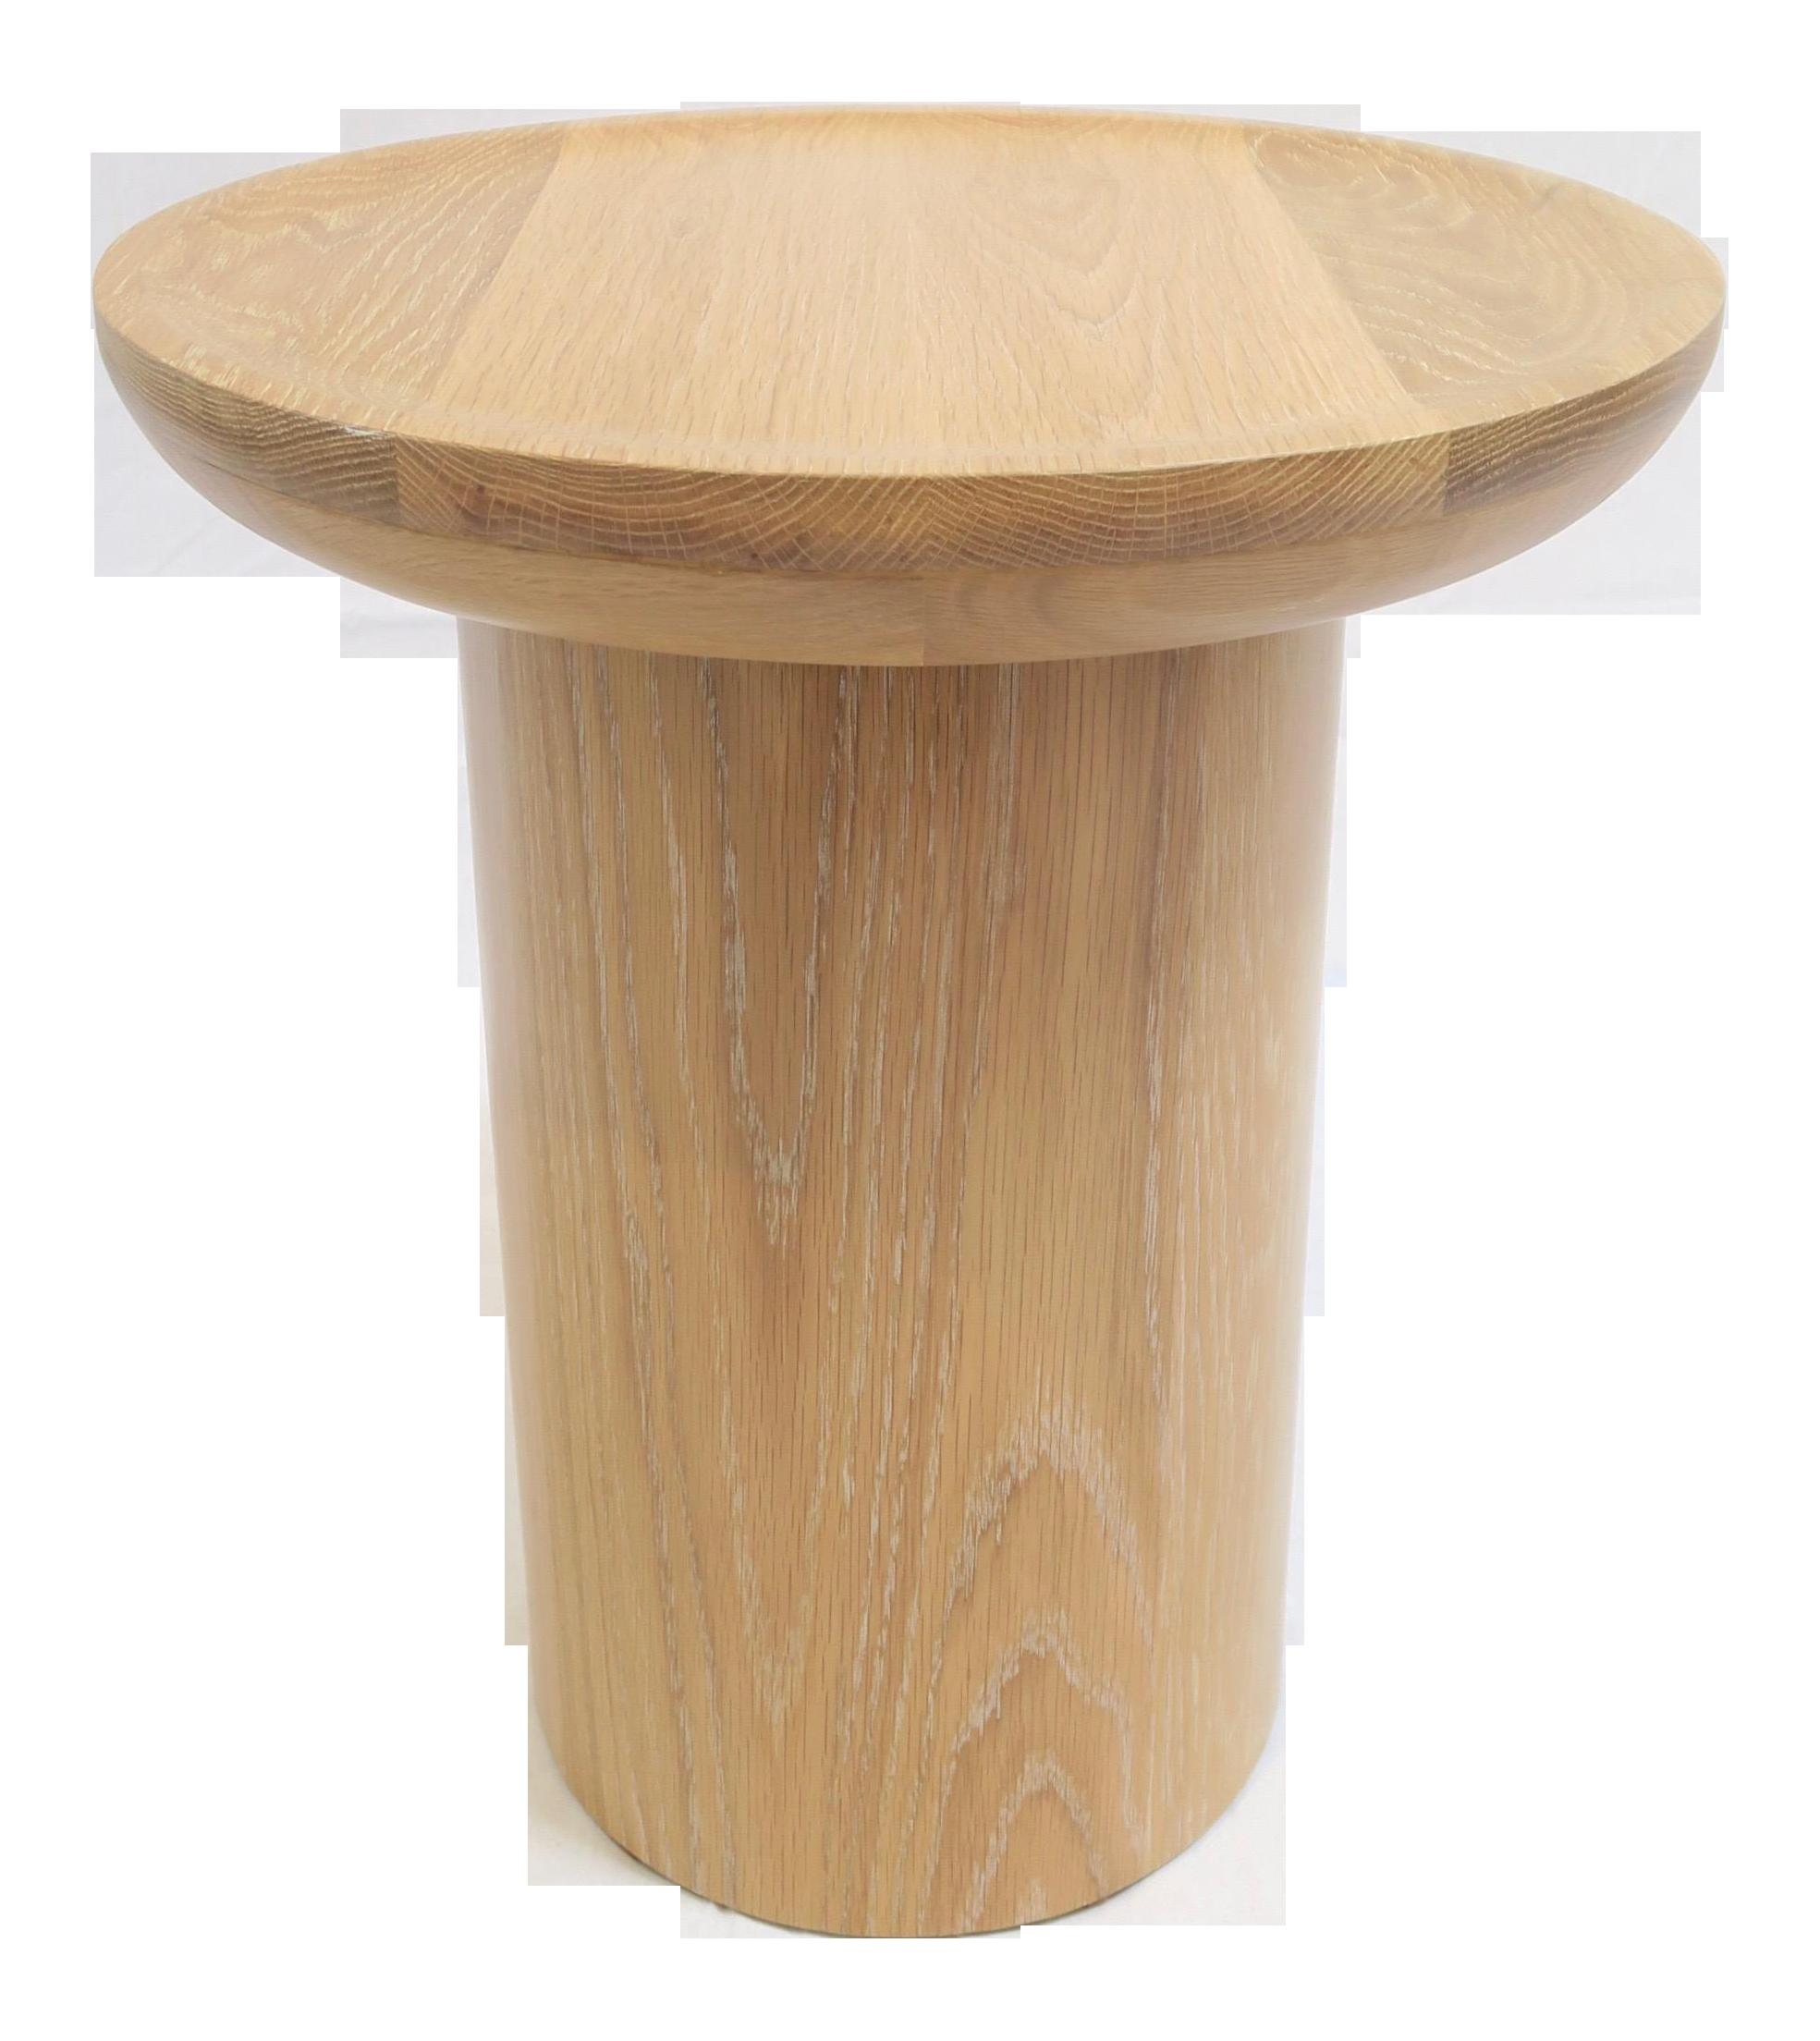 minimalist-martin-and-brockett-round-tall-findley-table-4814